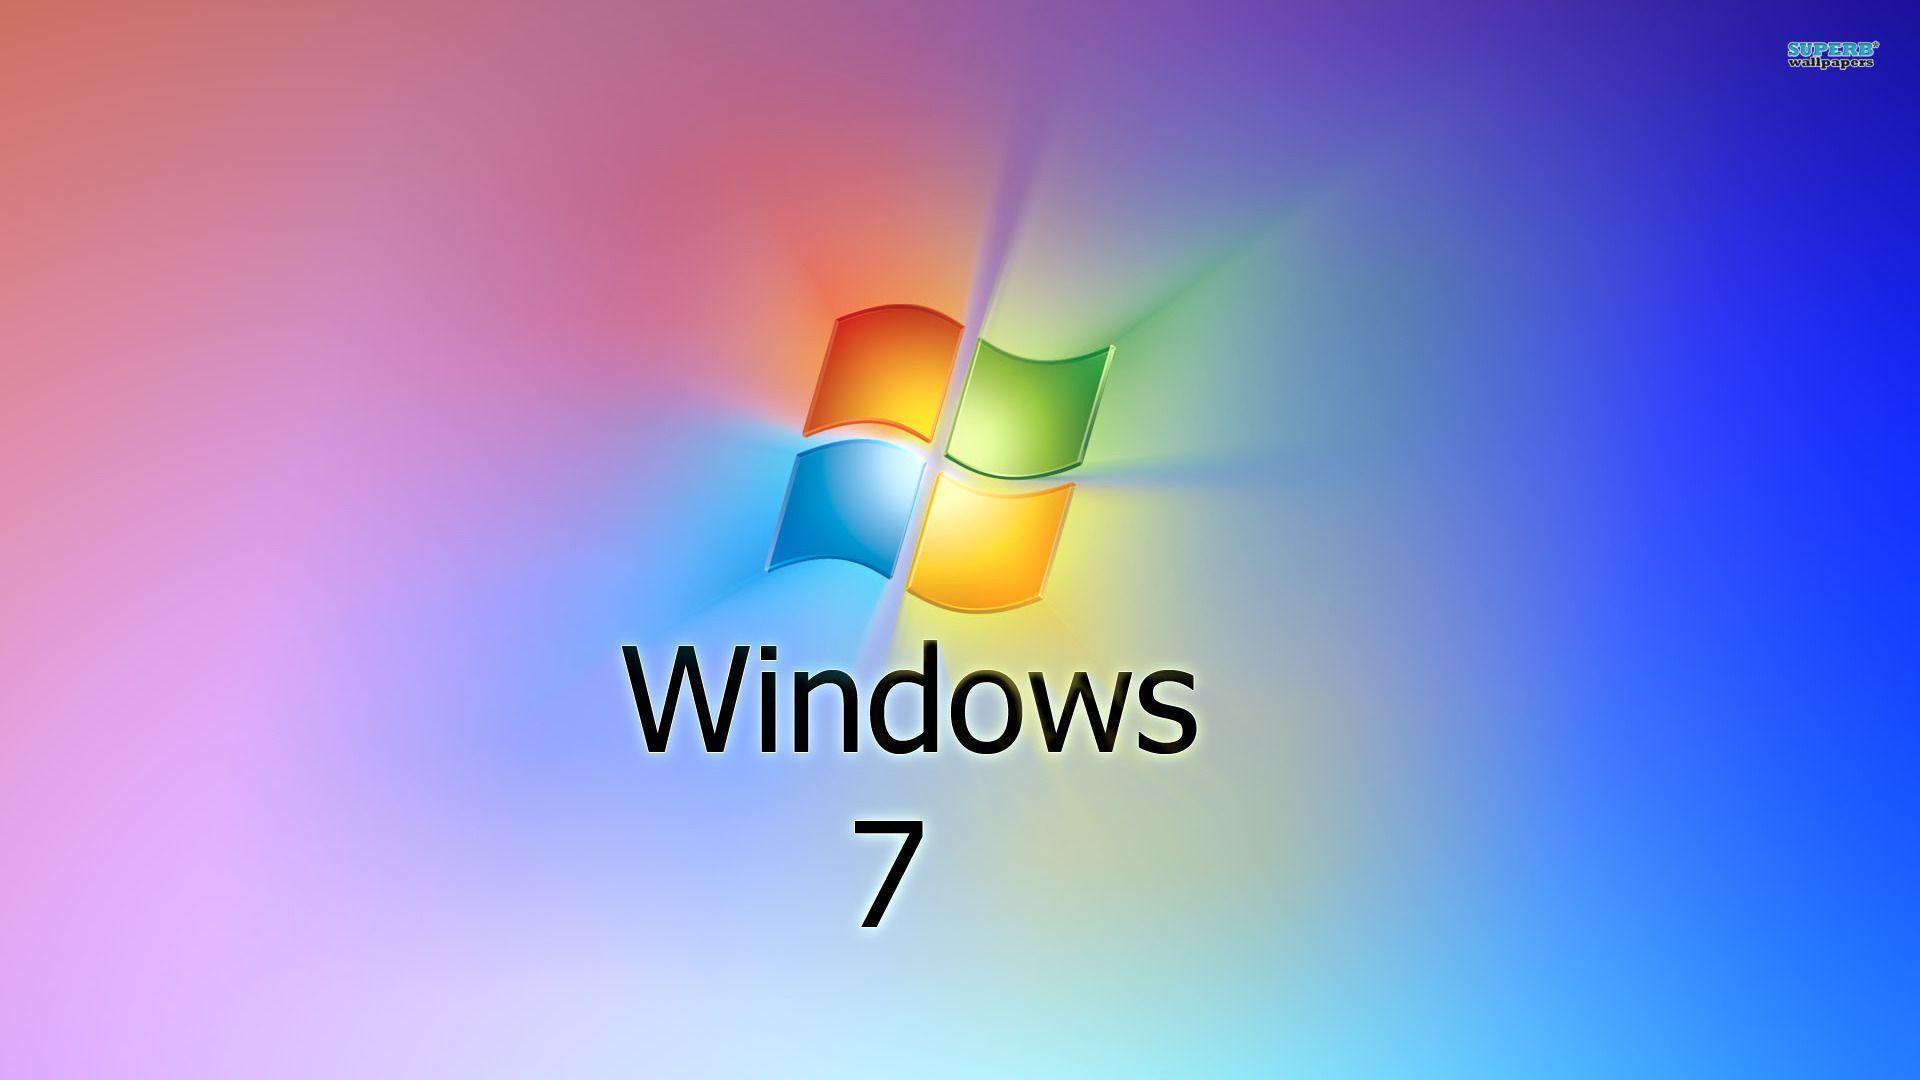 Windows 7 1920x1080 Hd Desktop Wallpaper Wild Animals Xp